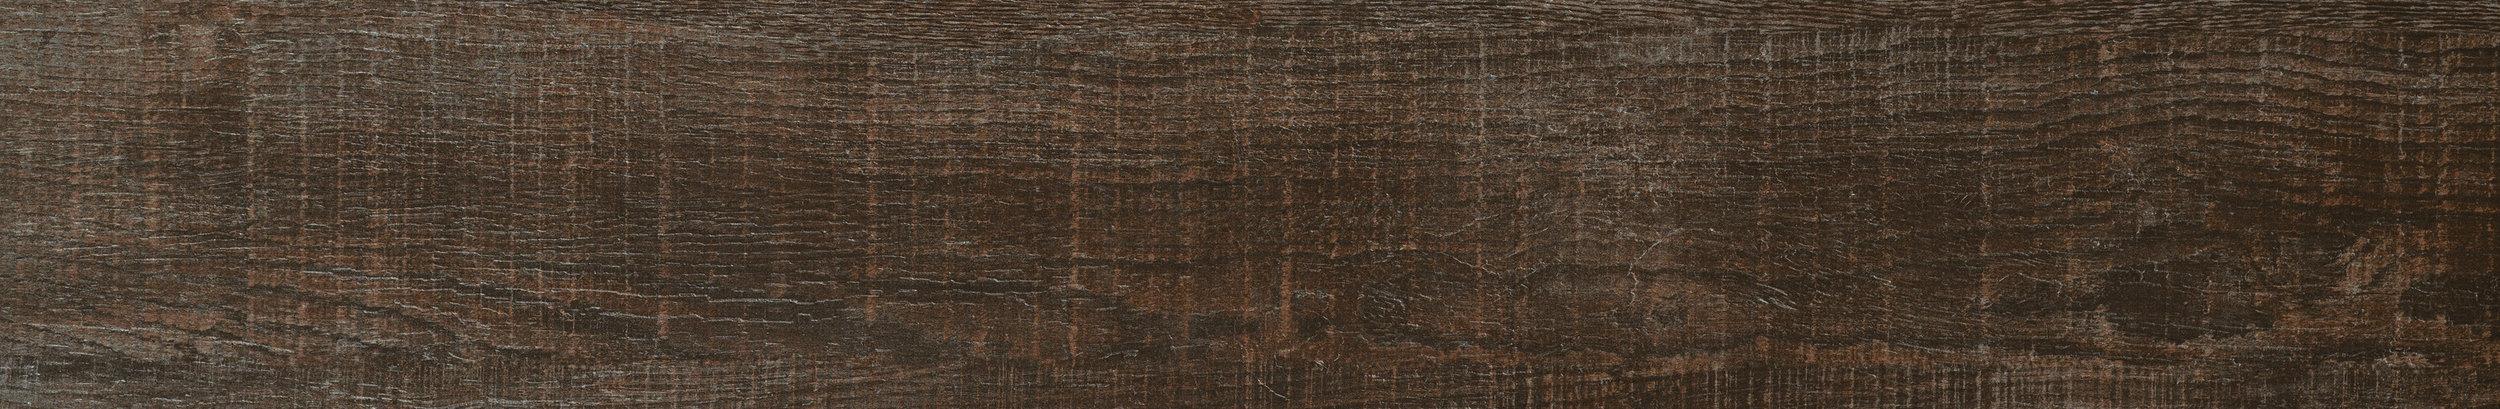 Burnet  Polished | KM.NN.BNT.0848.PL  Matte | KM.NN.BNT.0848.MT